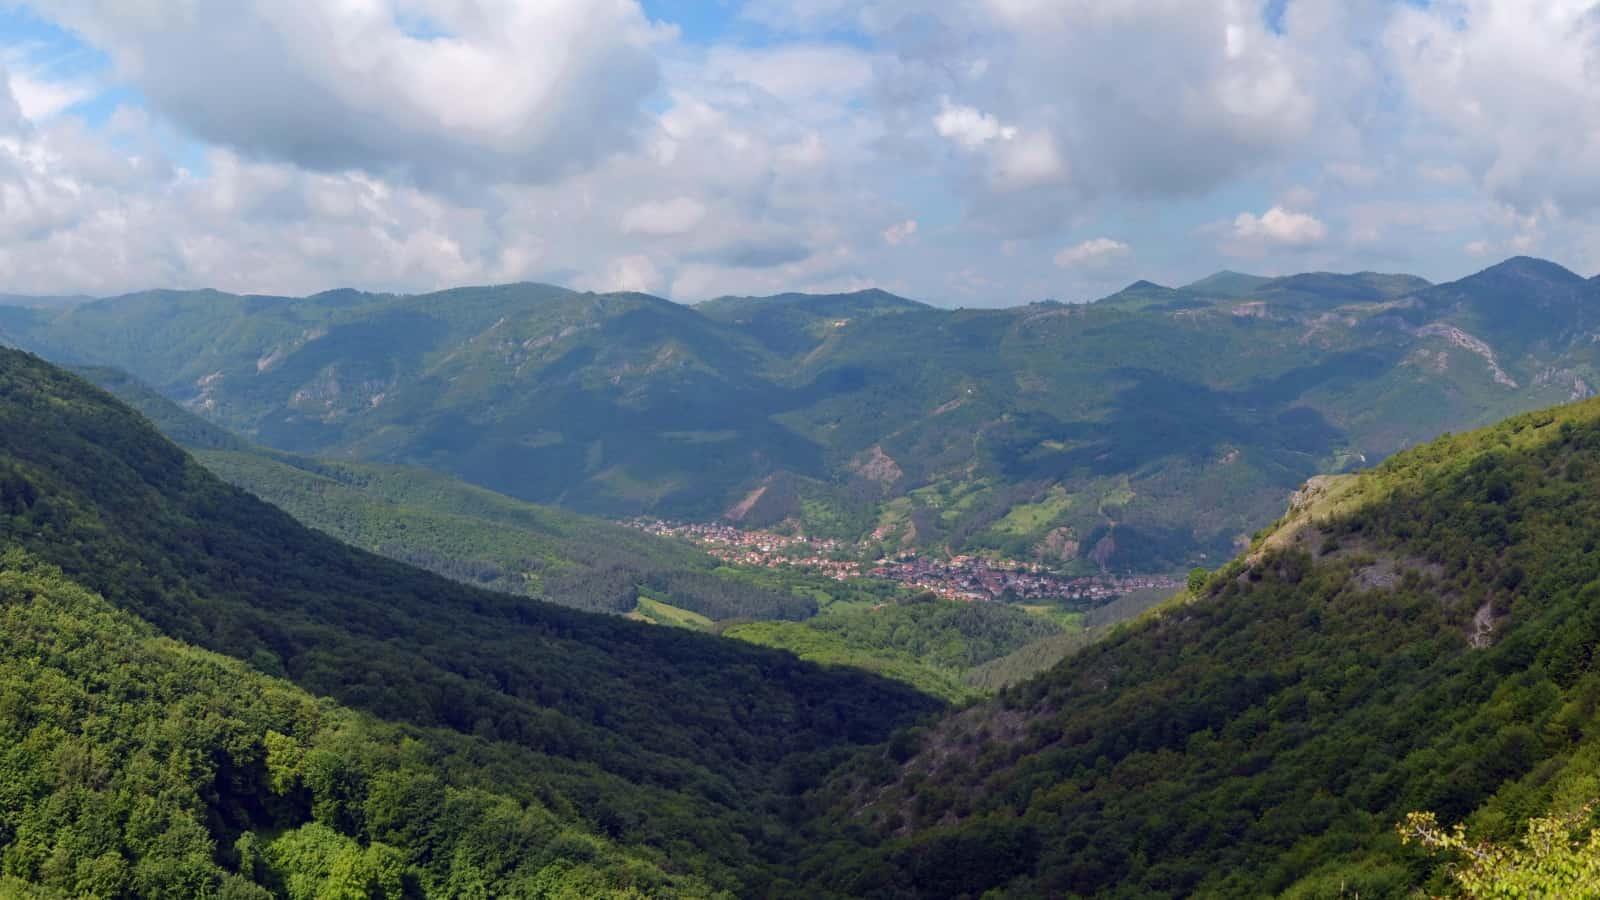 The village of Zgorigrad - Panorama view of Vrachanski Balkan Nature Park - photo: Vrachanski Balkan Nature Park/Krasimir Lakovski